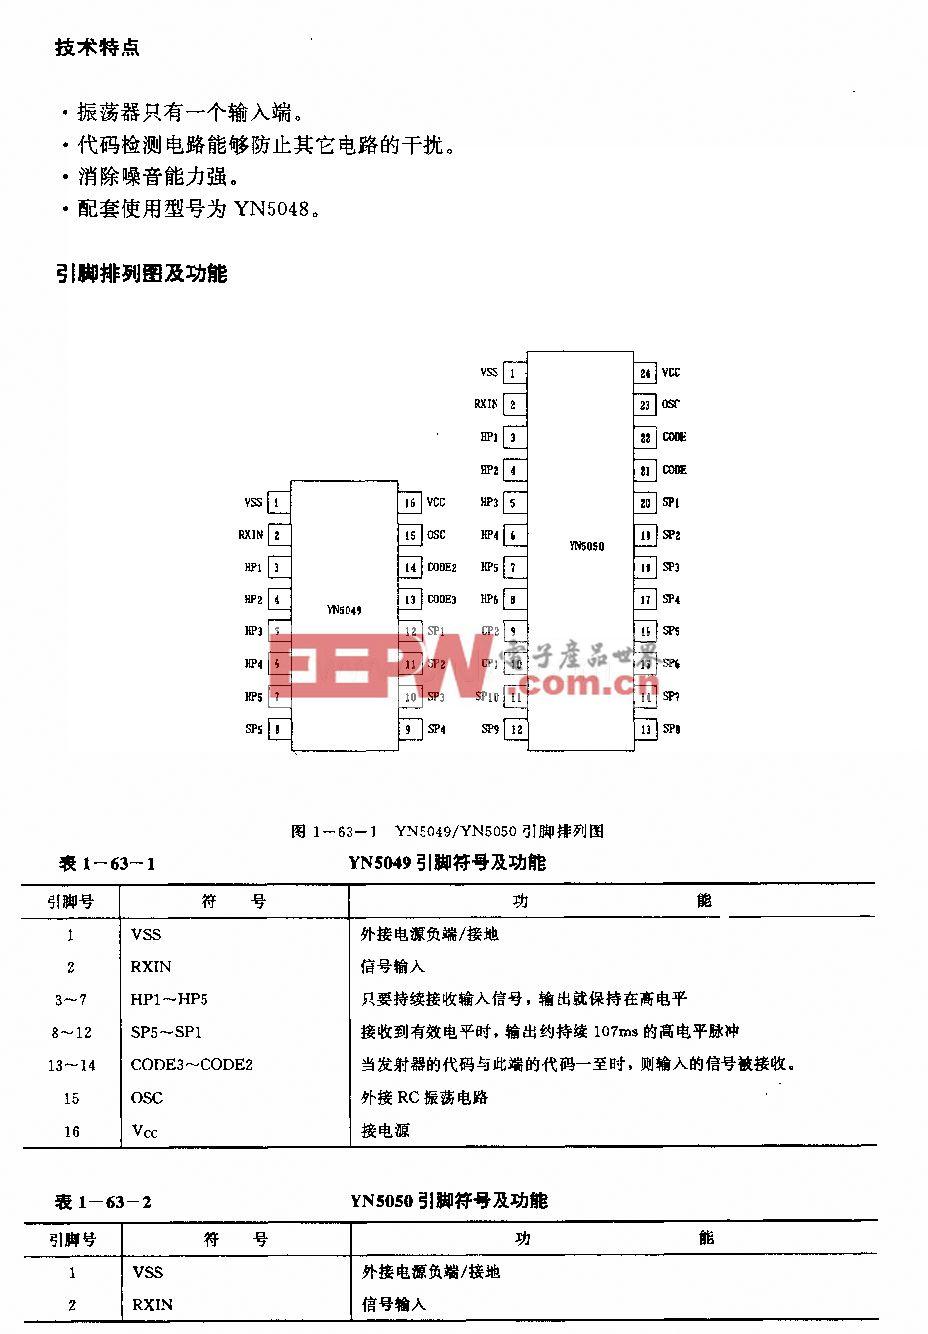 YN5049/YN5050 (電視機、錄像機和音響)紅外線遙控發射電路YN5049/YN5050 (電視機、錄像機和音響)紅外線遙